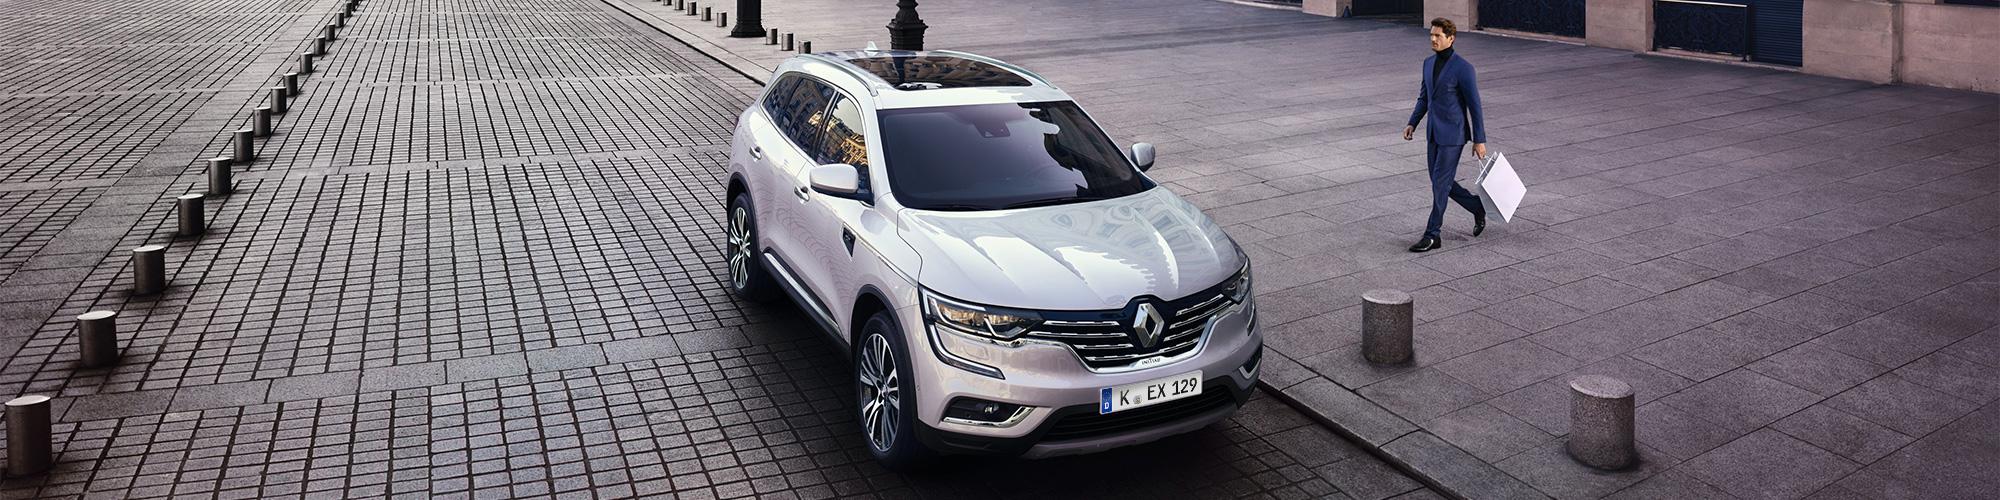 Neuer Renault KOLEOS in Genf